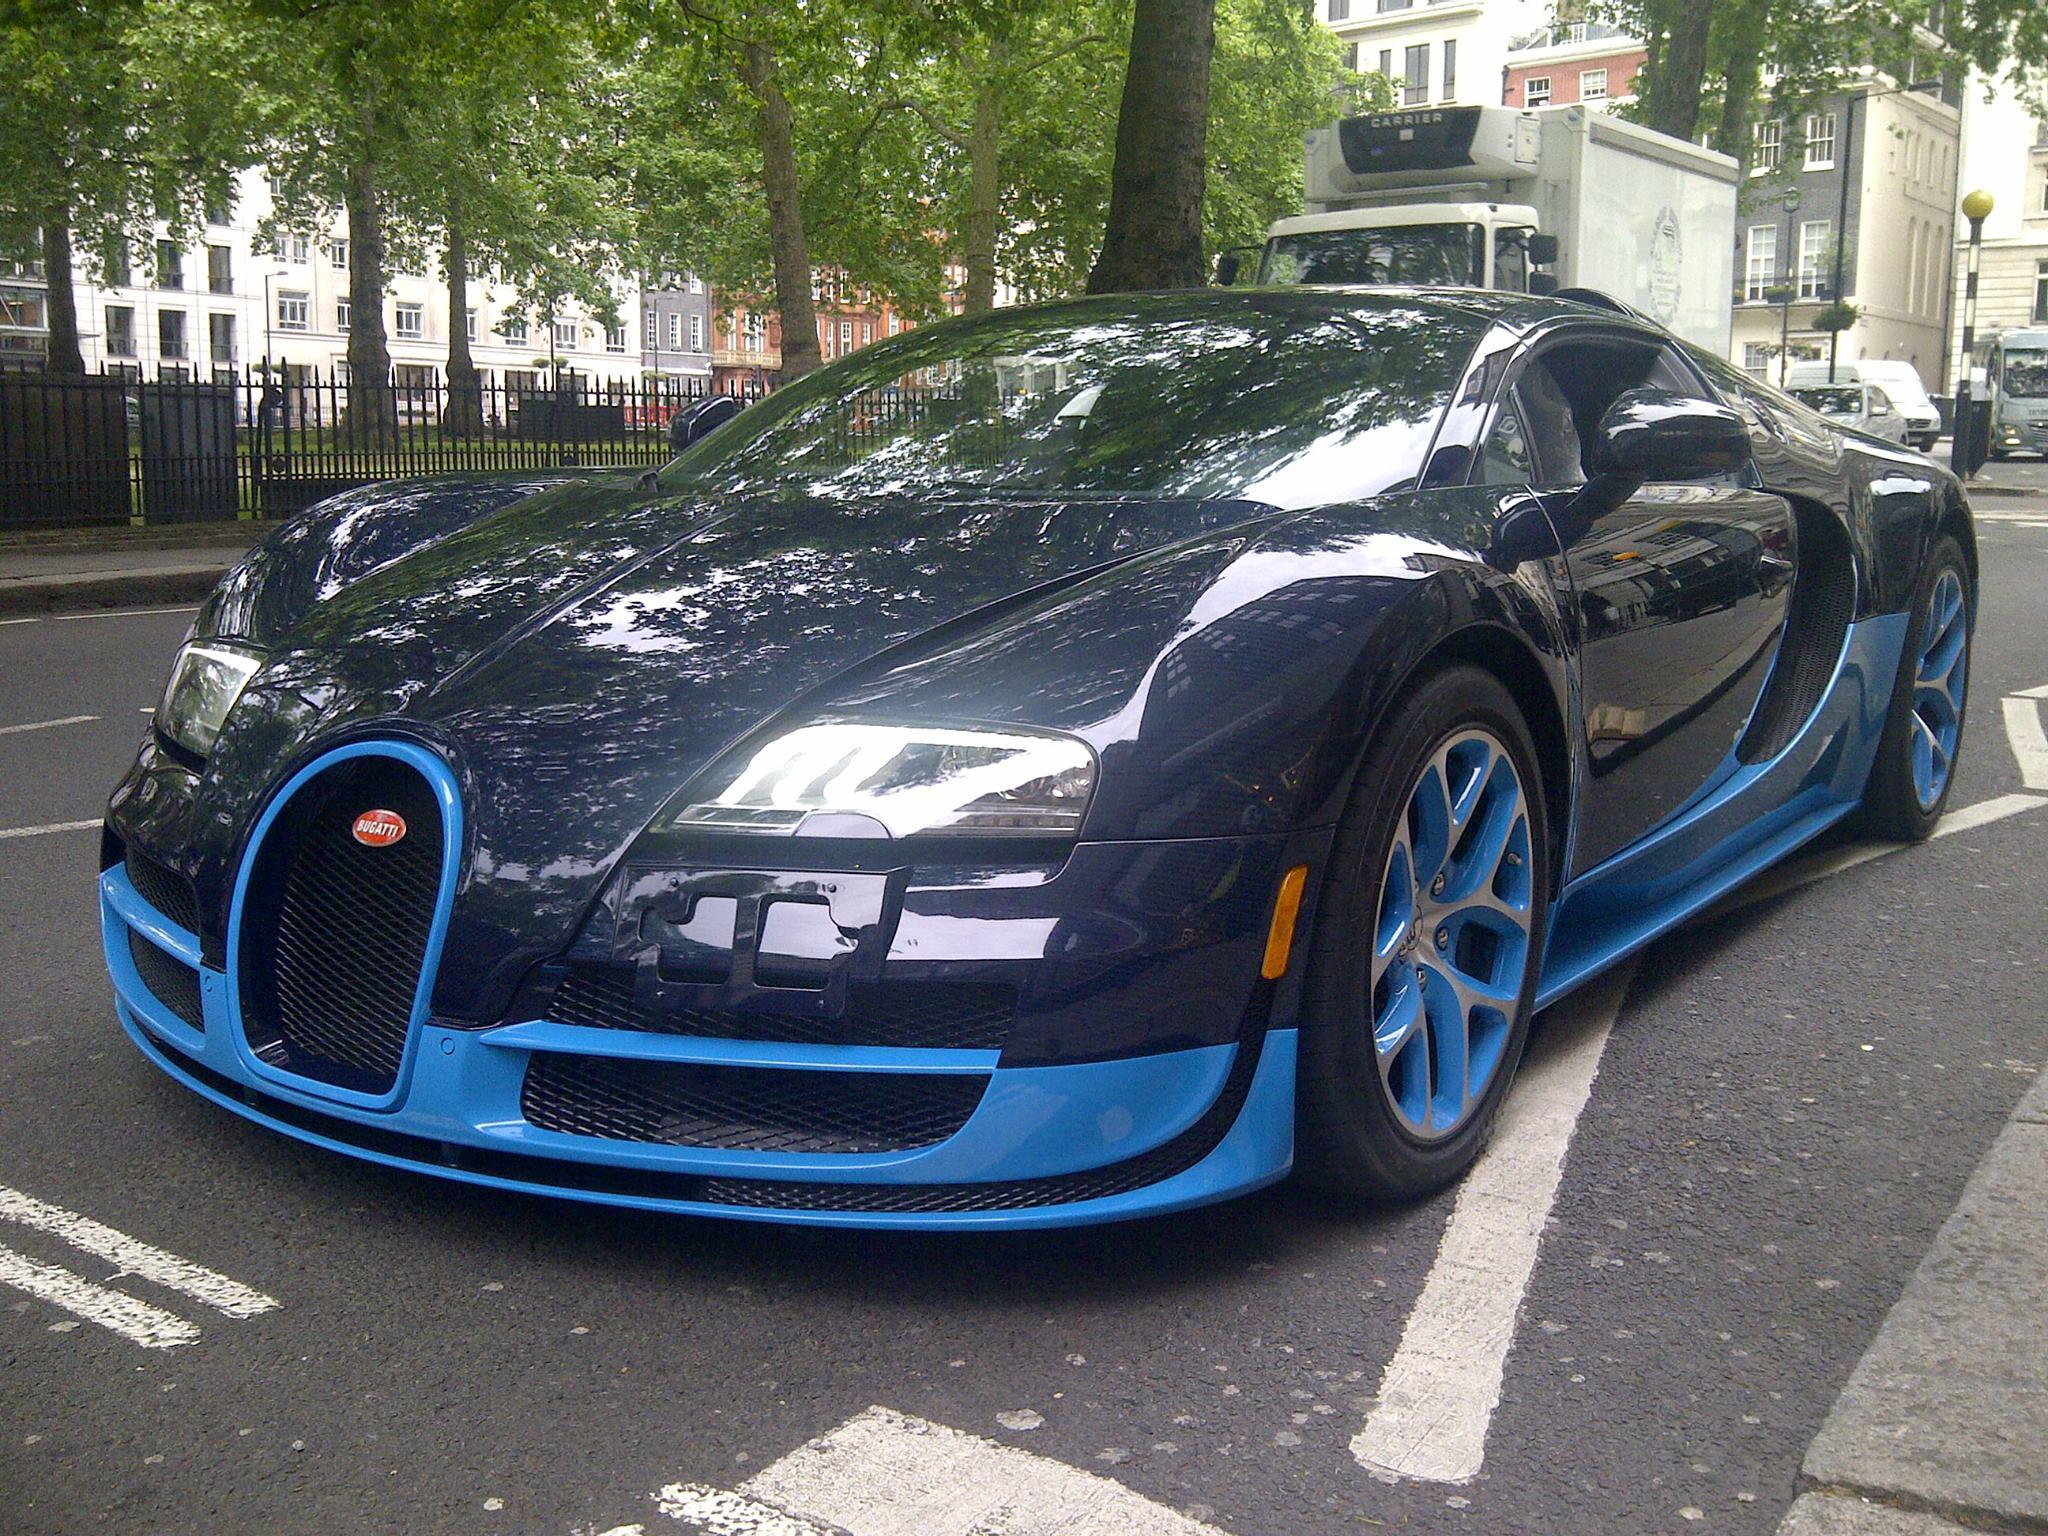 Bugatti Veyron in London - www.hartvoorautos.nl